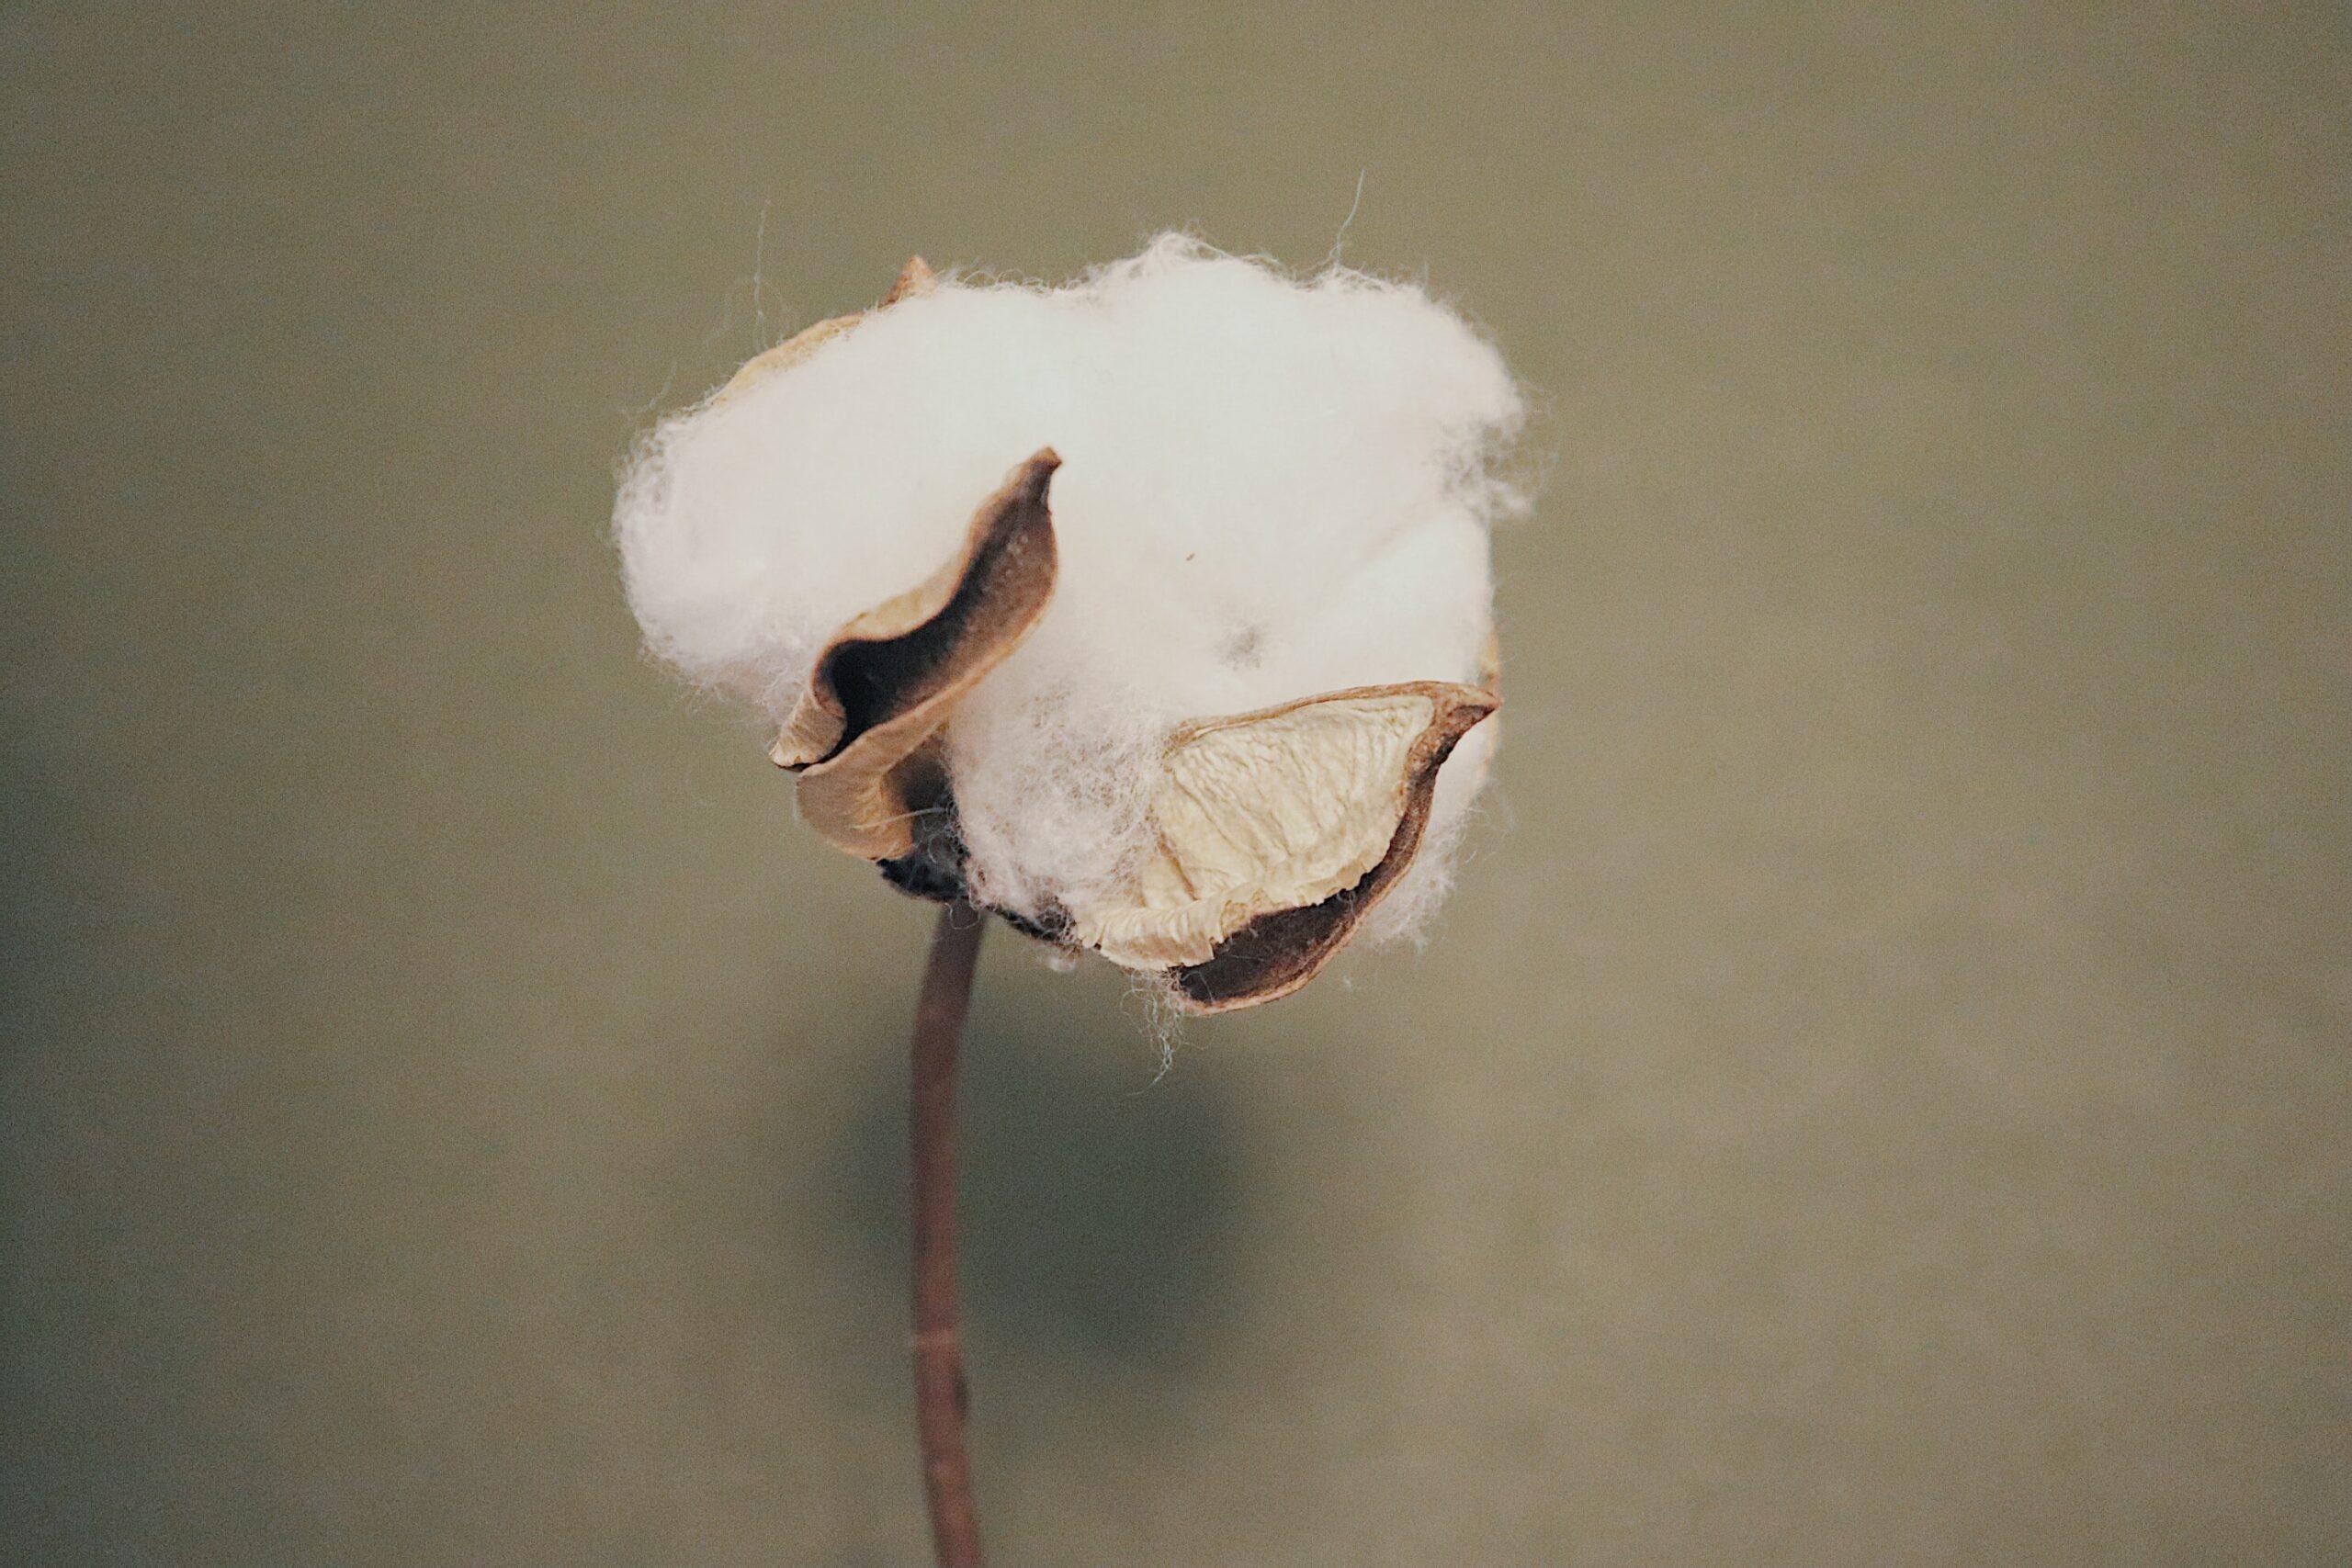 turkmenistan cotton harvest